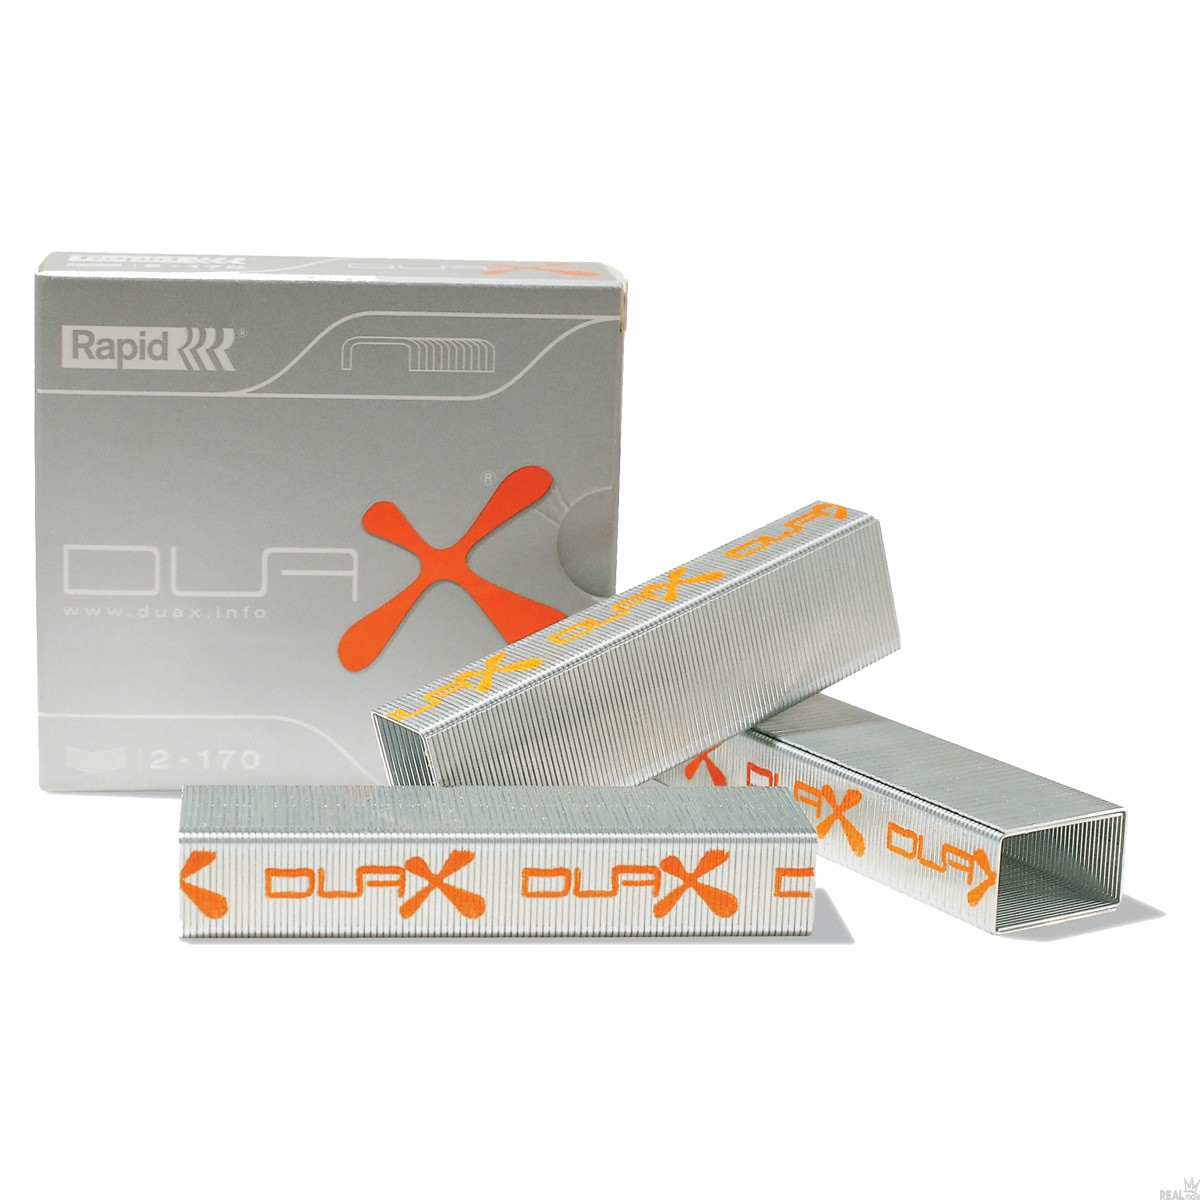 Grampos Rapid Duax 2-170 Cx com 1000 Grampos 14920